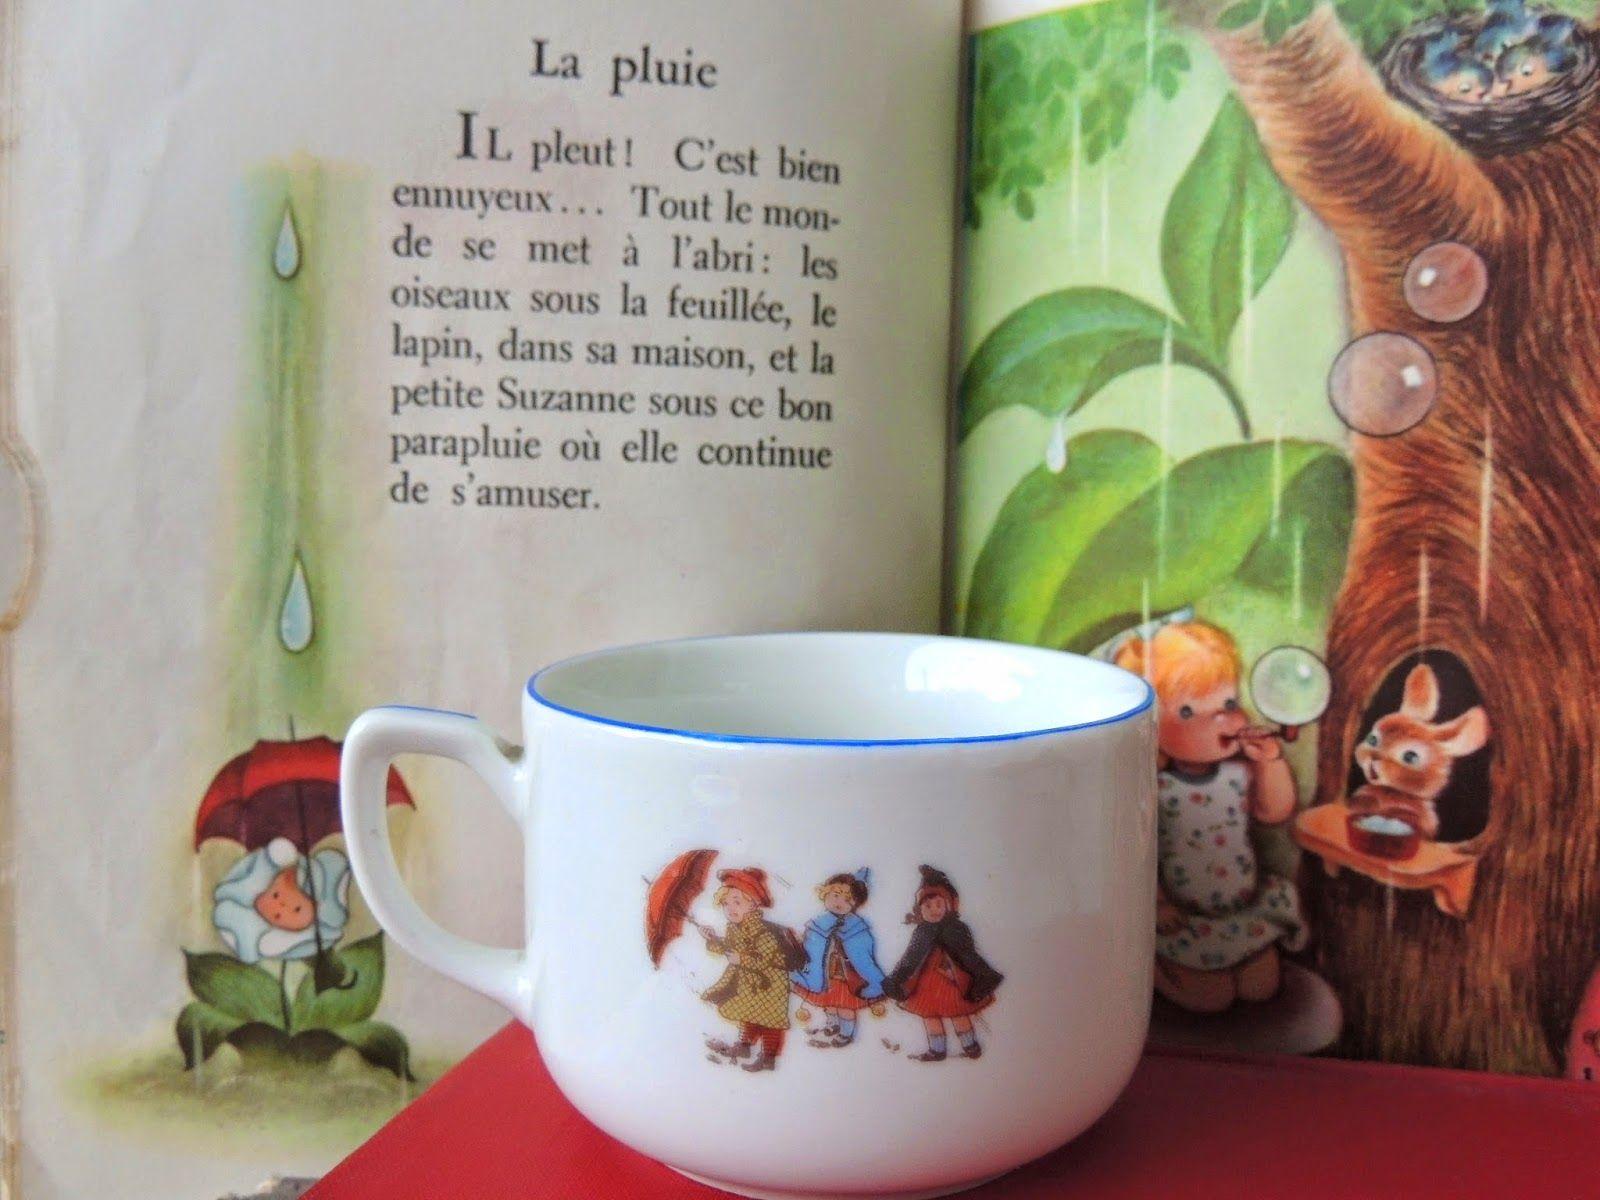 Tazas & Cuentos: Platos infantiles / Children's plates